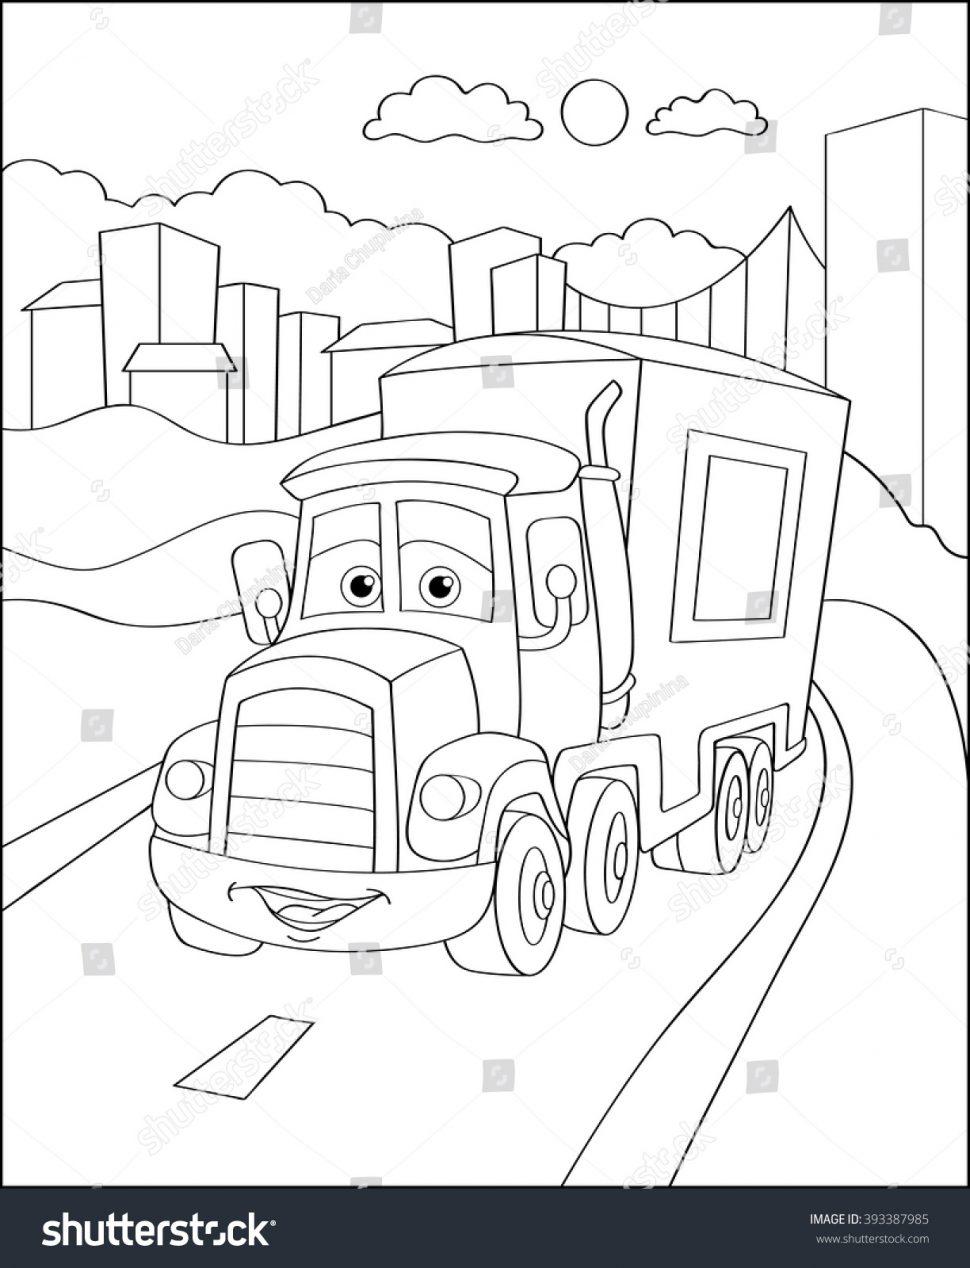 970x1268 Coloring City Coloring Book Phenomenal Wpid Screenshot 2015